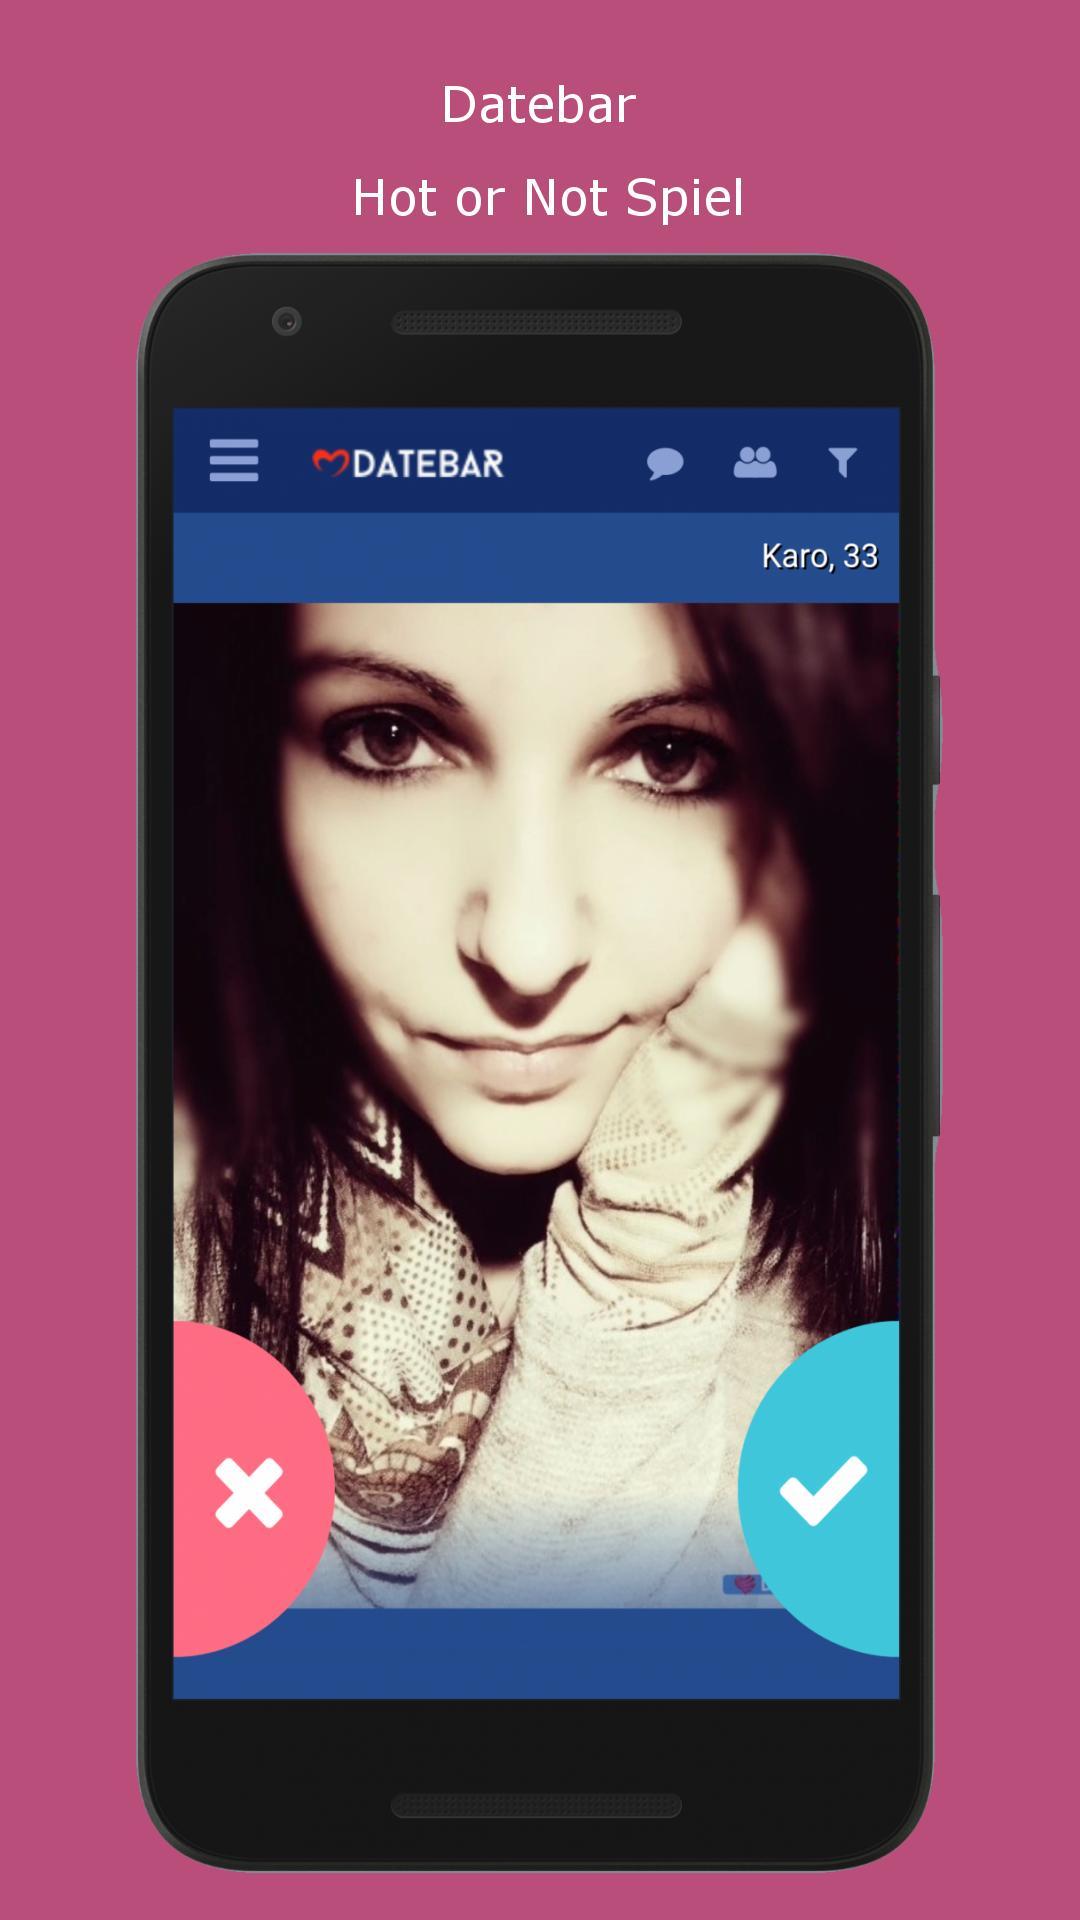 kárá johka speed dating maura singelklubb